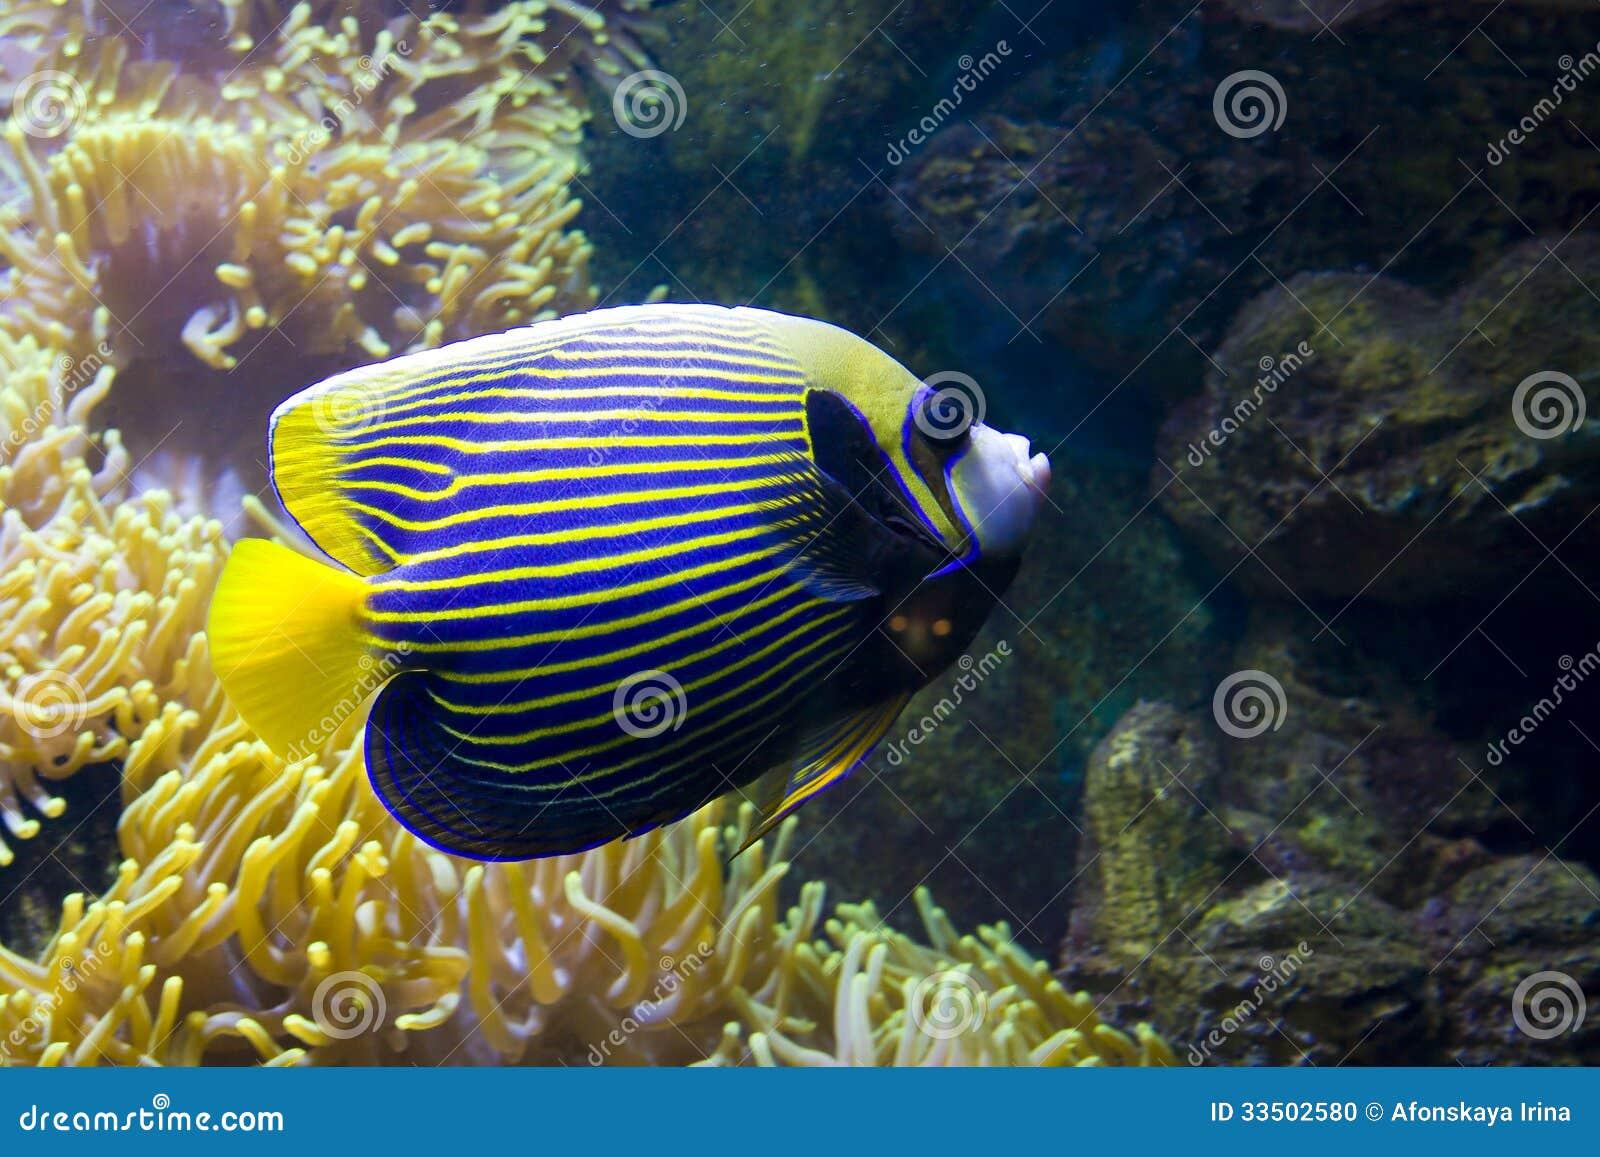 Fish Angel Fish Emperor And Actinia Sea Anemone Stock